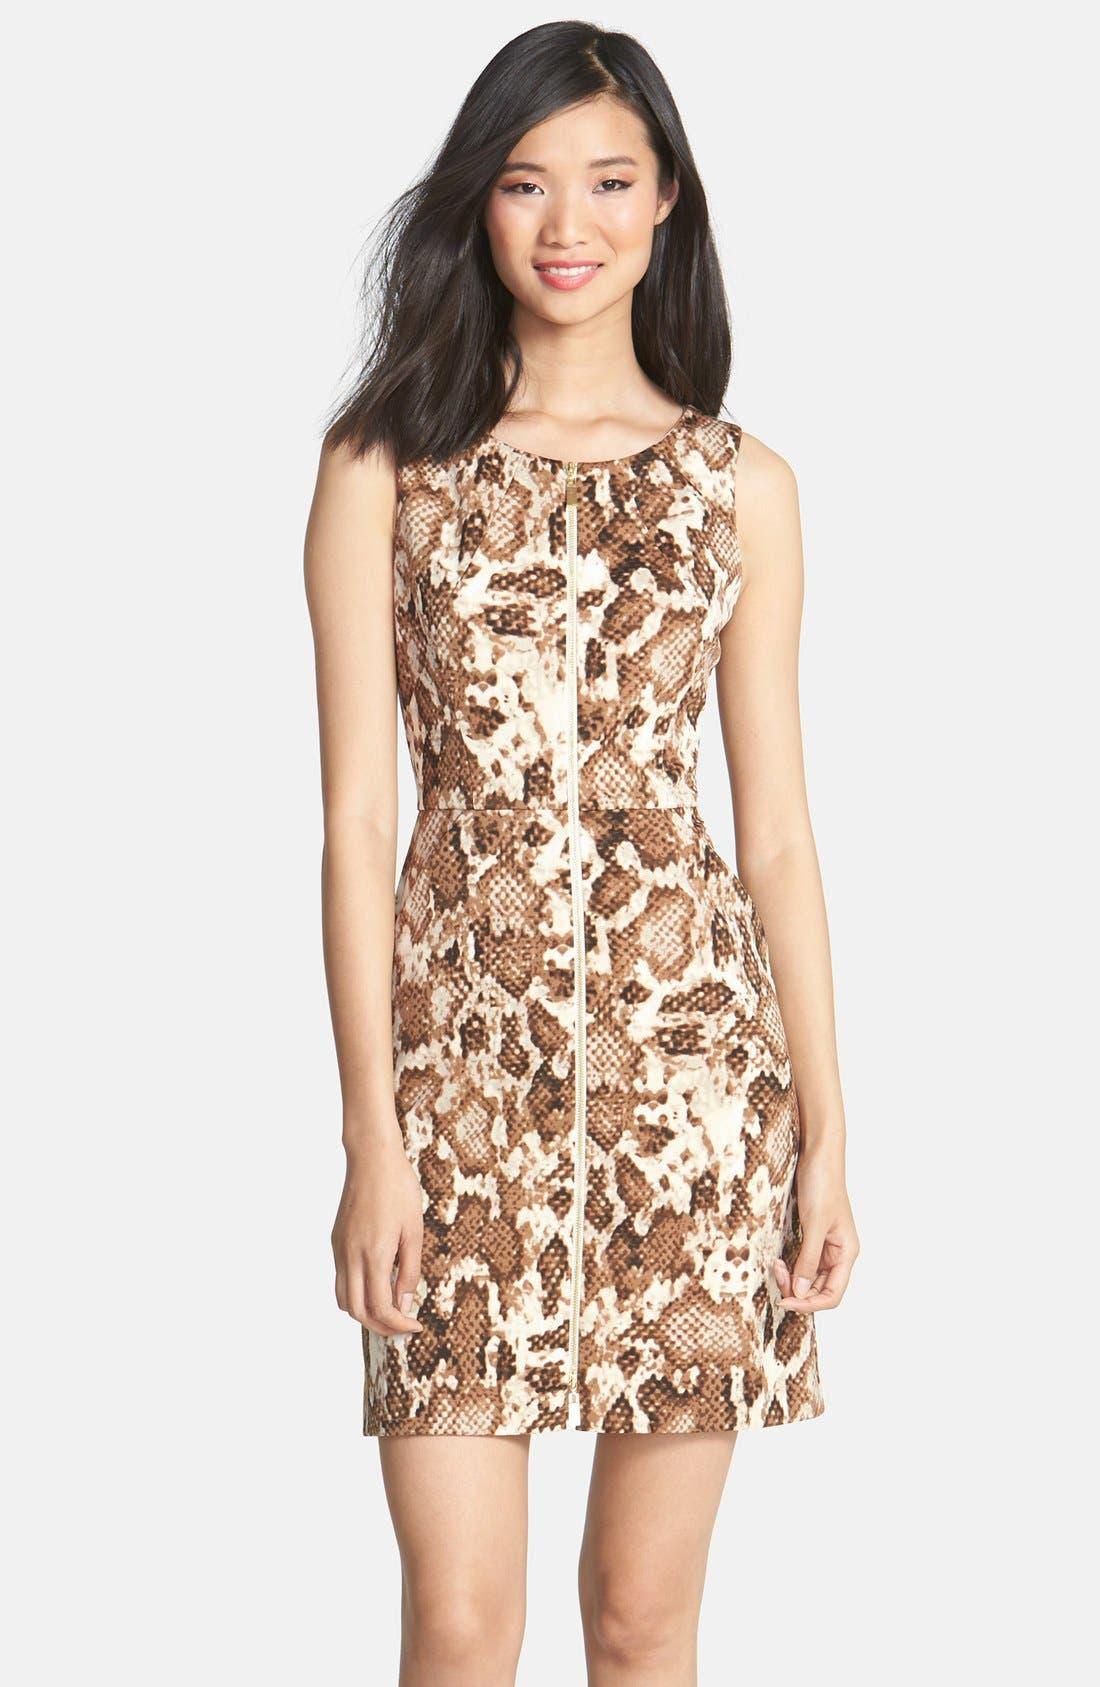 Alternate Image 1 Selected - Vince Camuto Zip Front Snakeskin Print Scuba Dress